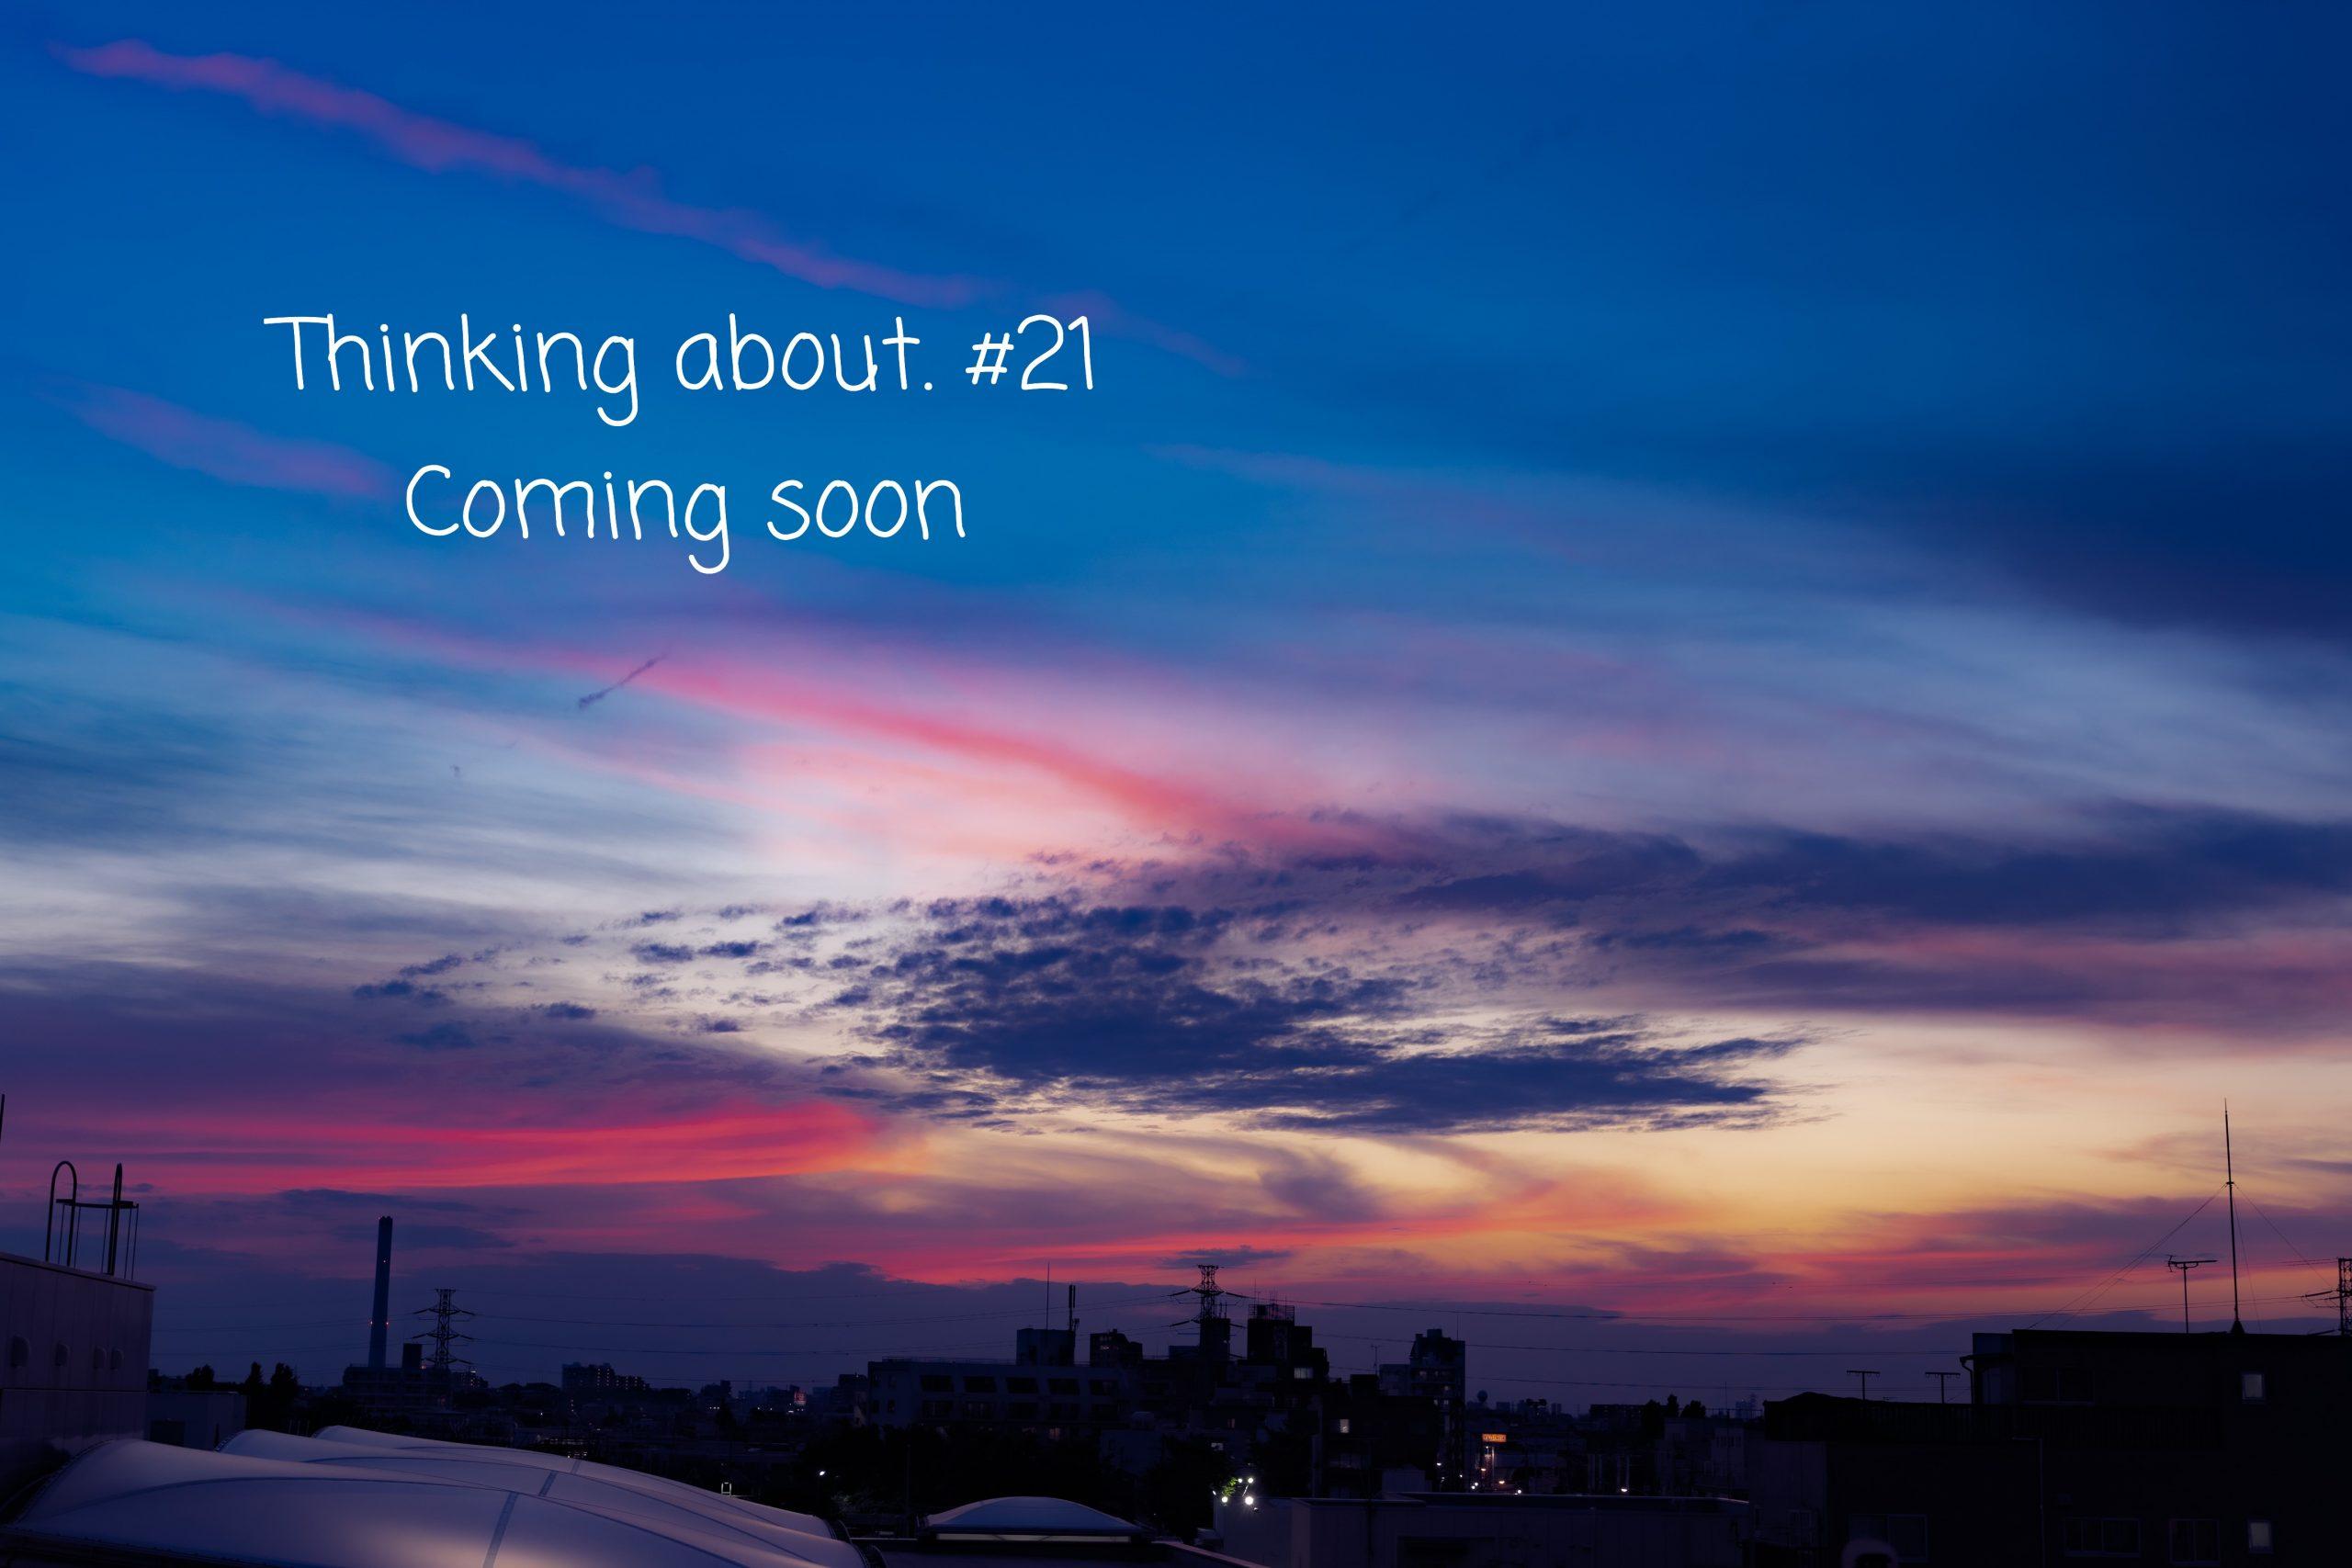 【Thinking about.#21】カルマの洗浄